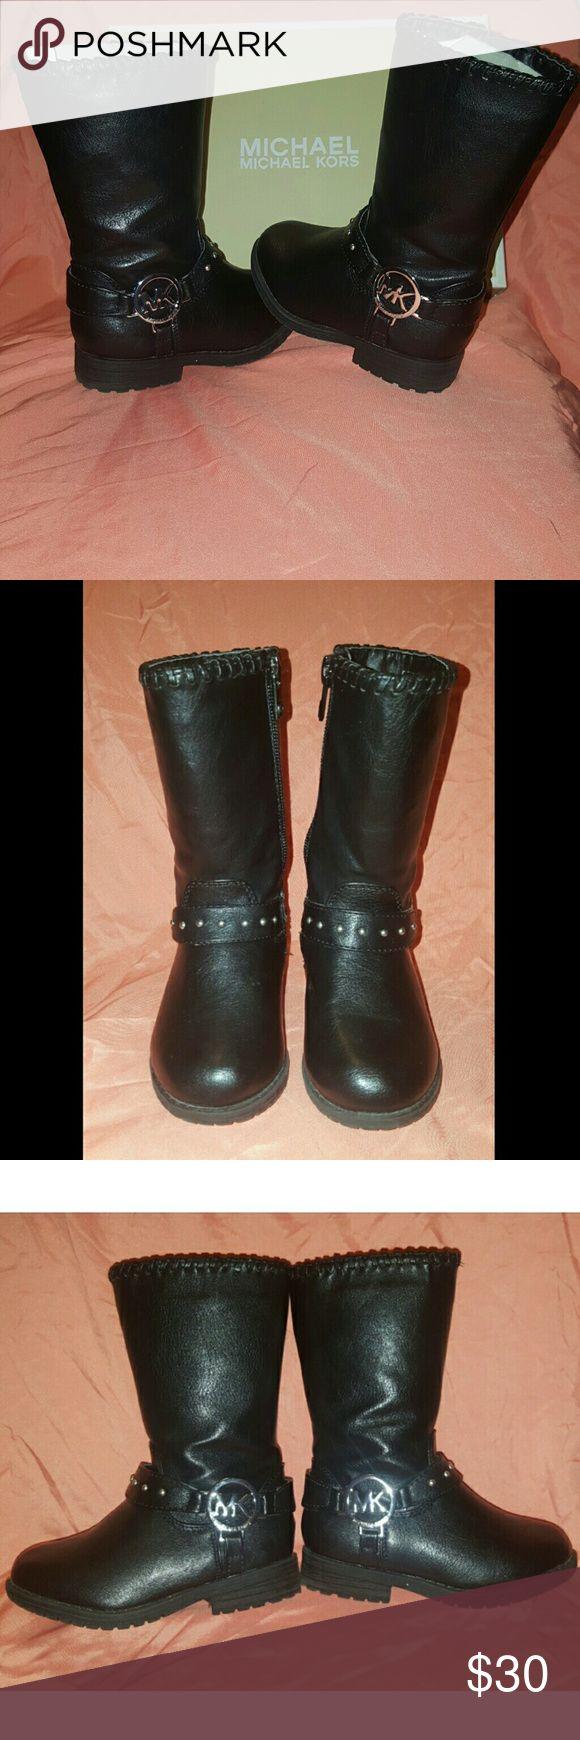 "MK Lil Carlita Toddler Girls Boots Michael Kors ""Lil Carlita"" Boots Pre-owned (excellent condition) Zipper Closure  w/ORIGINAL BOX Michael Kors Shoes"